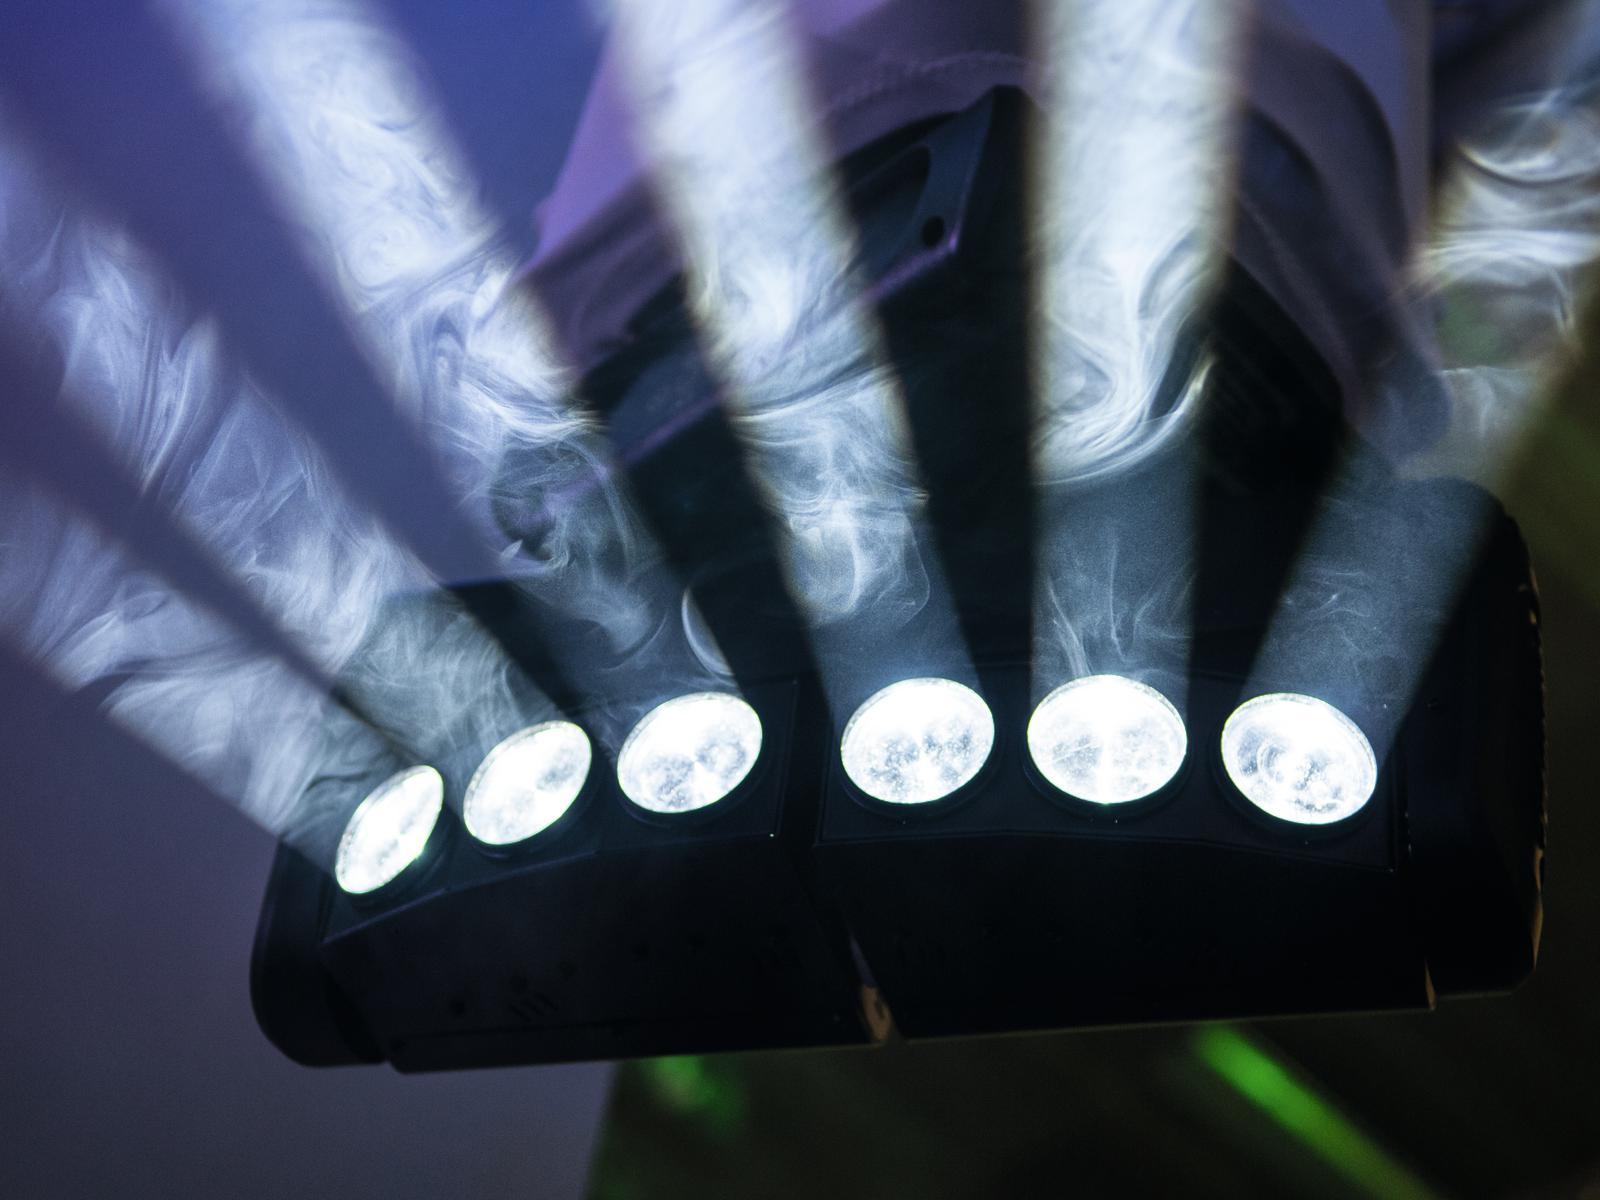 Category Ldi 2014 Barbizon Lighting Company Ketra N3 Satellite Wiring Diagram Futurelight Wave Fixture From Inner Circle Distribution